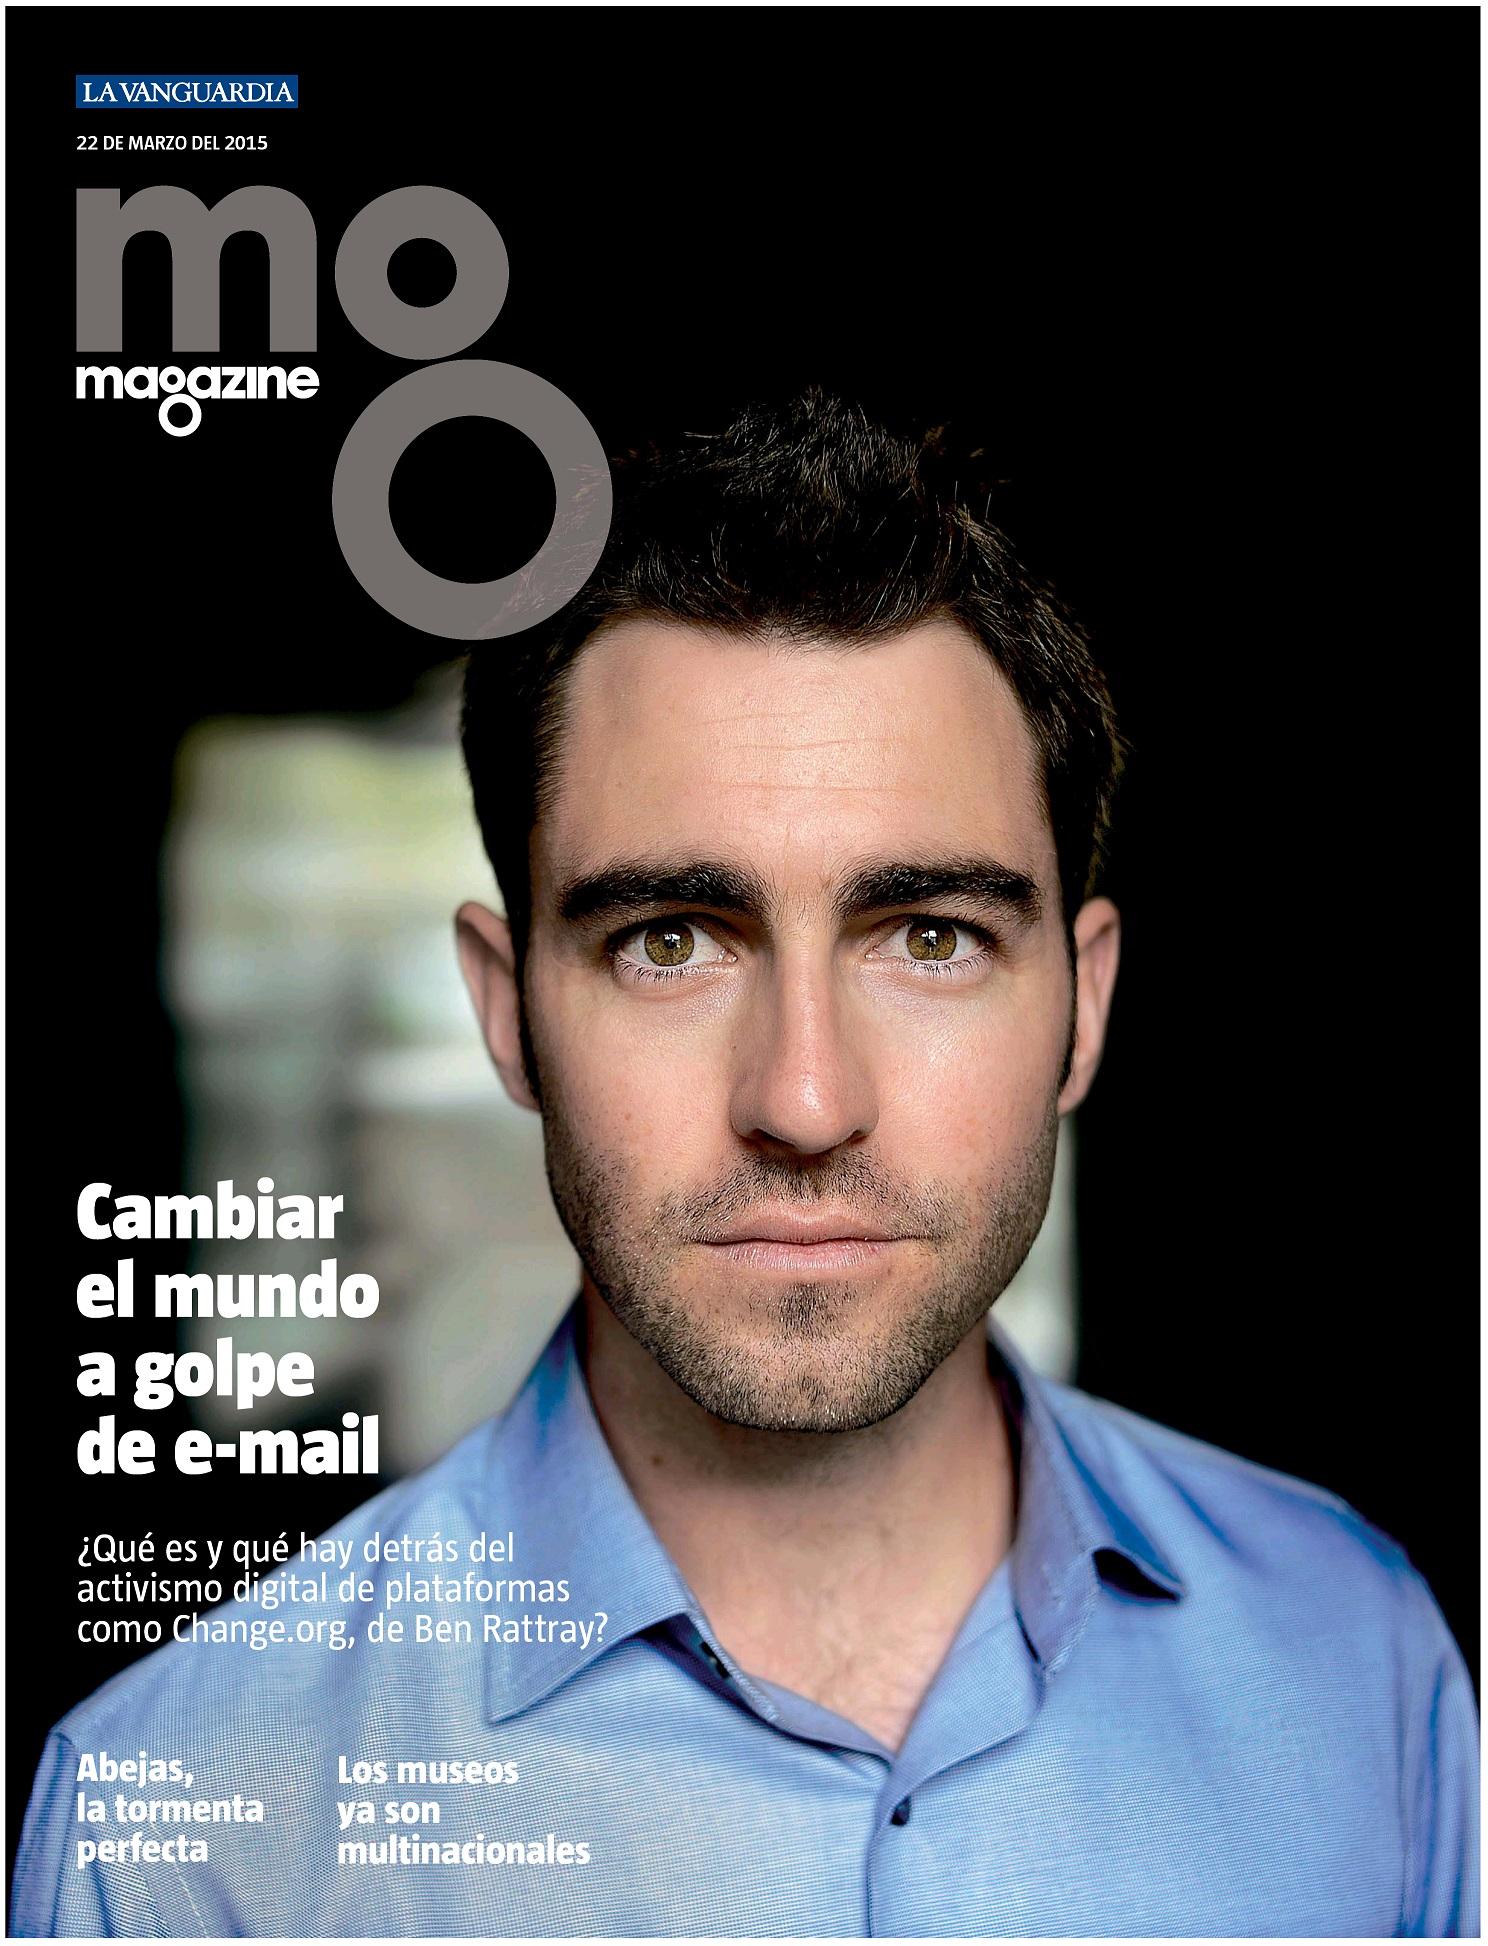 MEGAZINE portada 22 de Marzo 2015